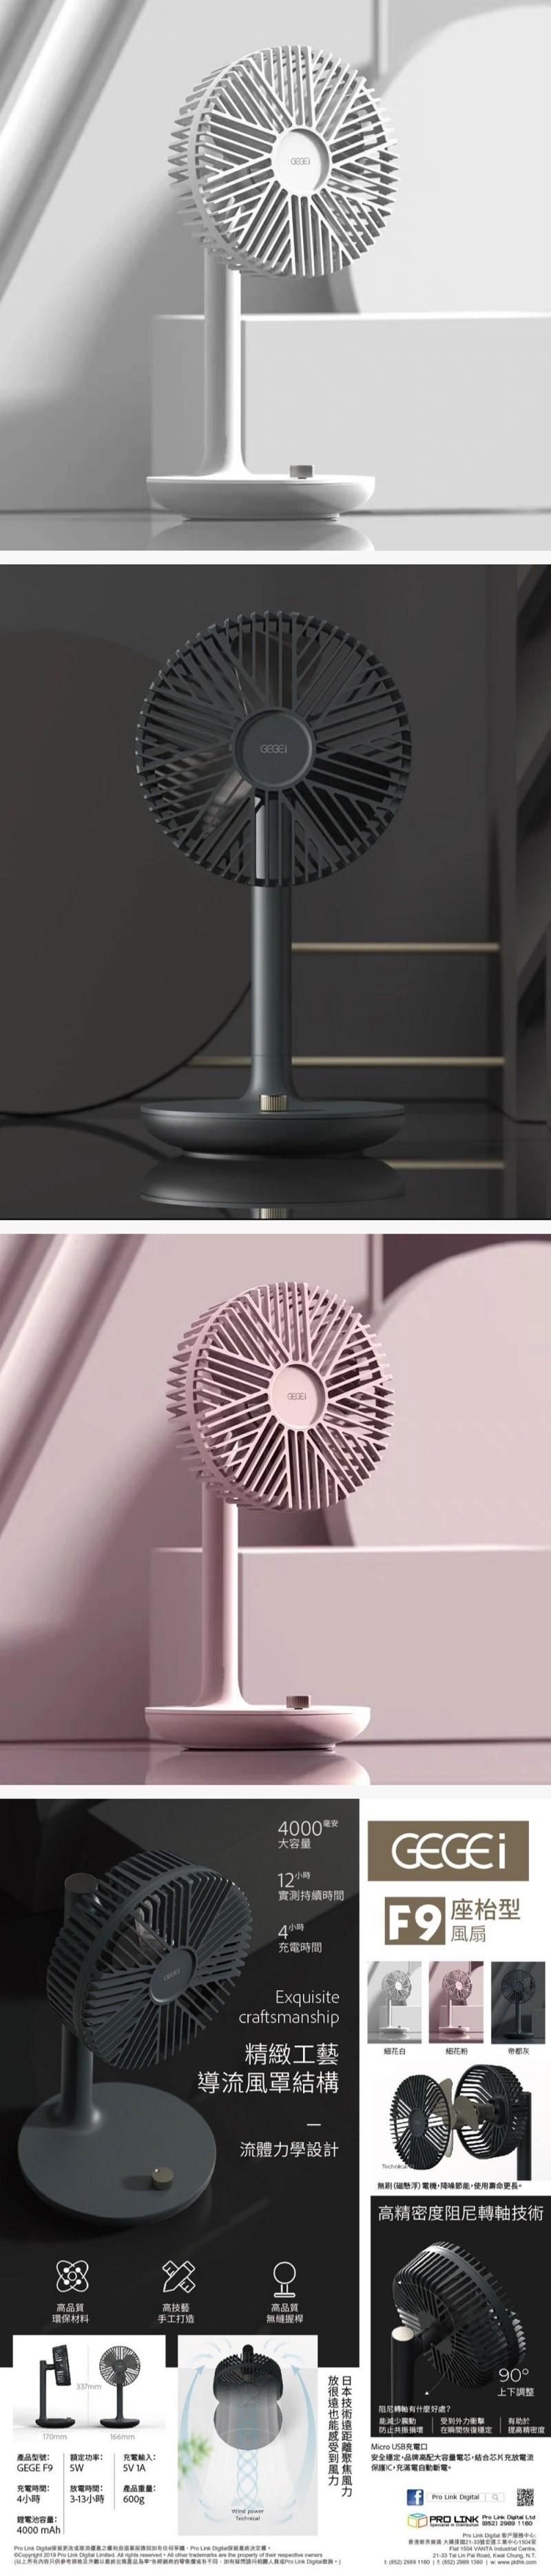 GEGEIF9 桌上型電扇 白